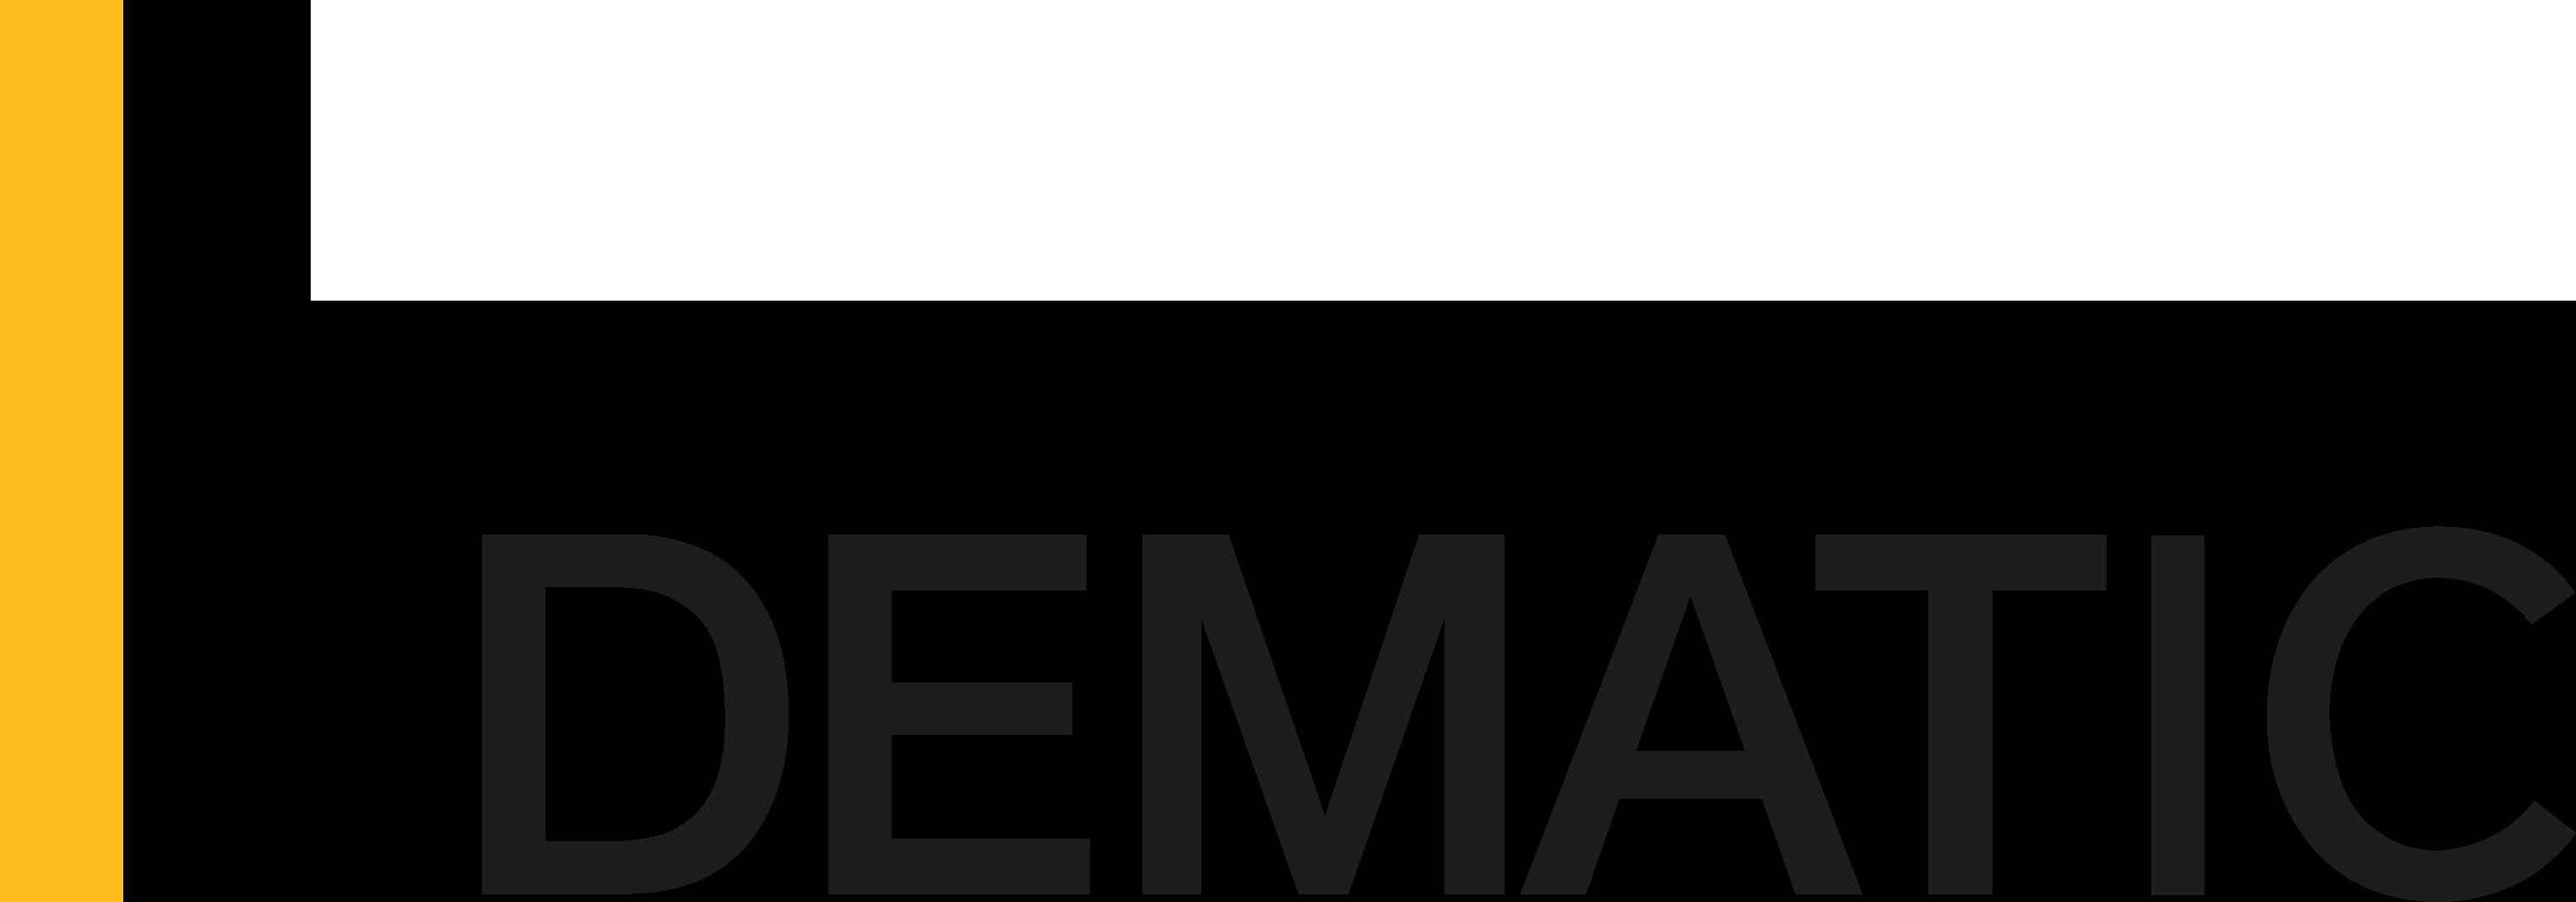 Dematic's logo